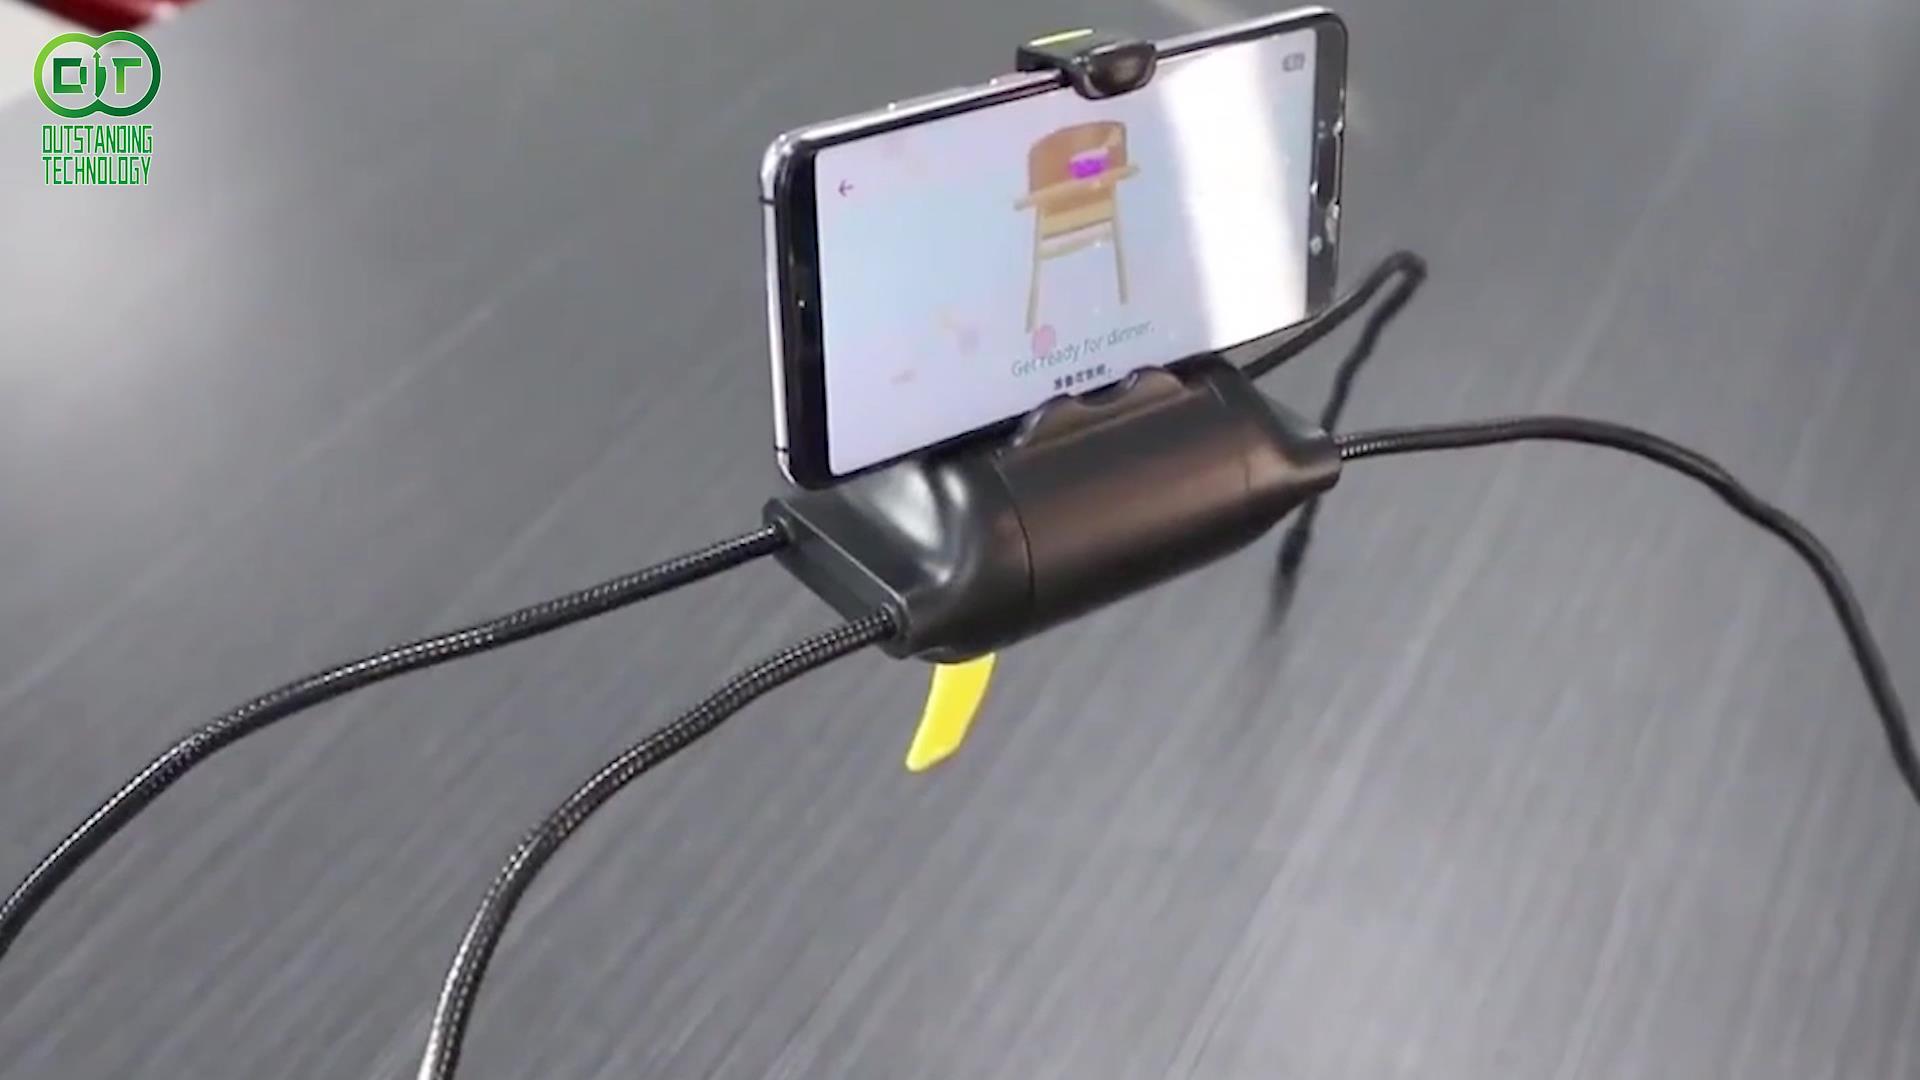 Company Product Display